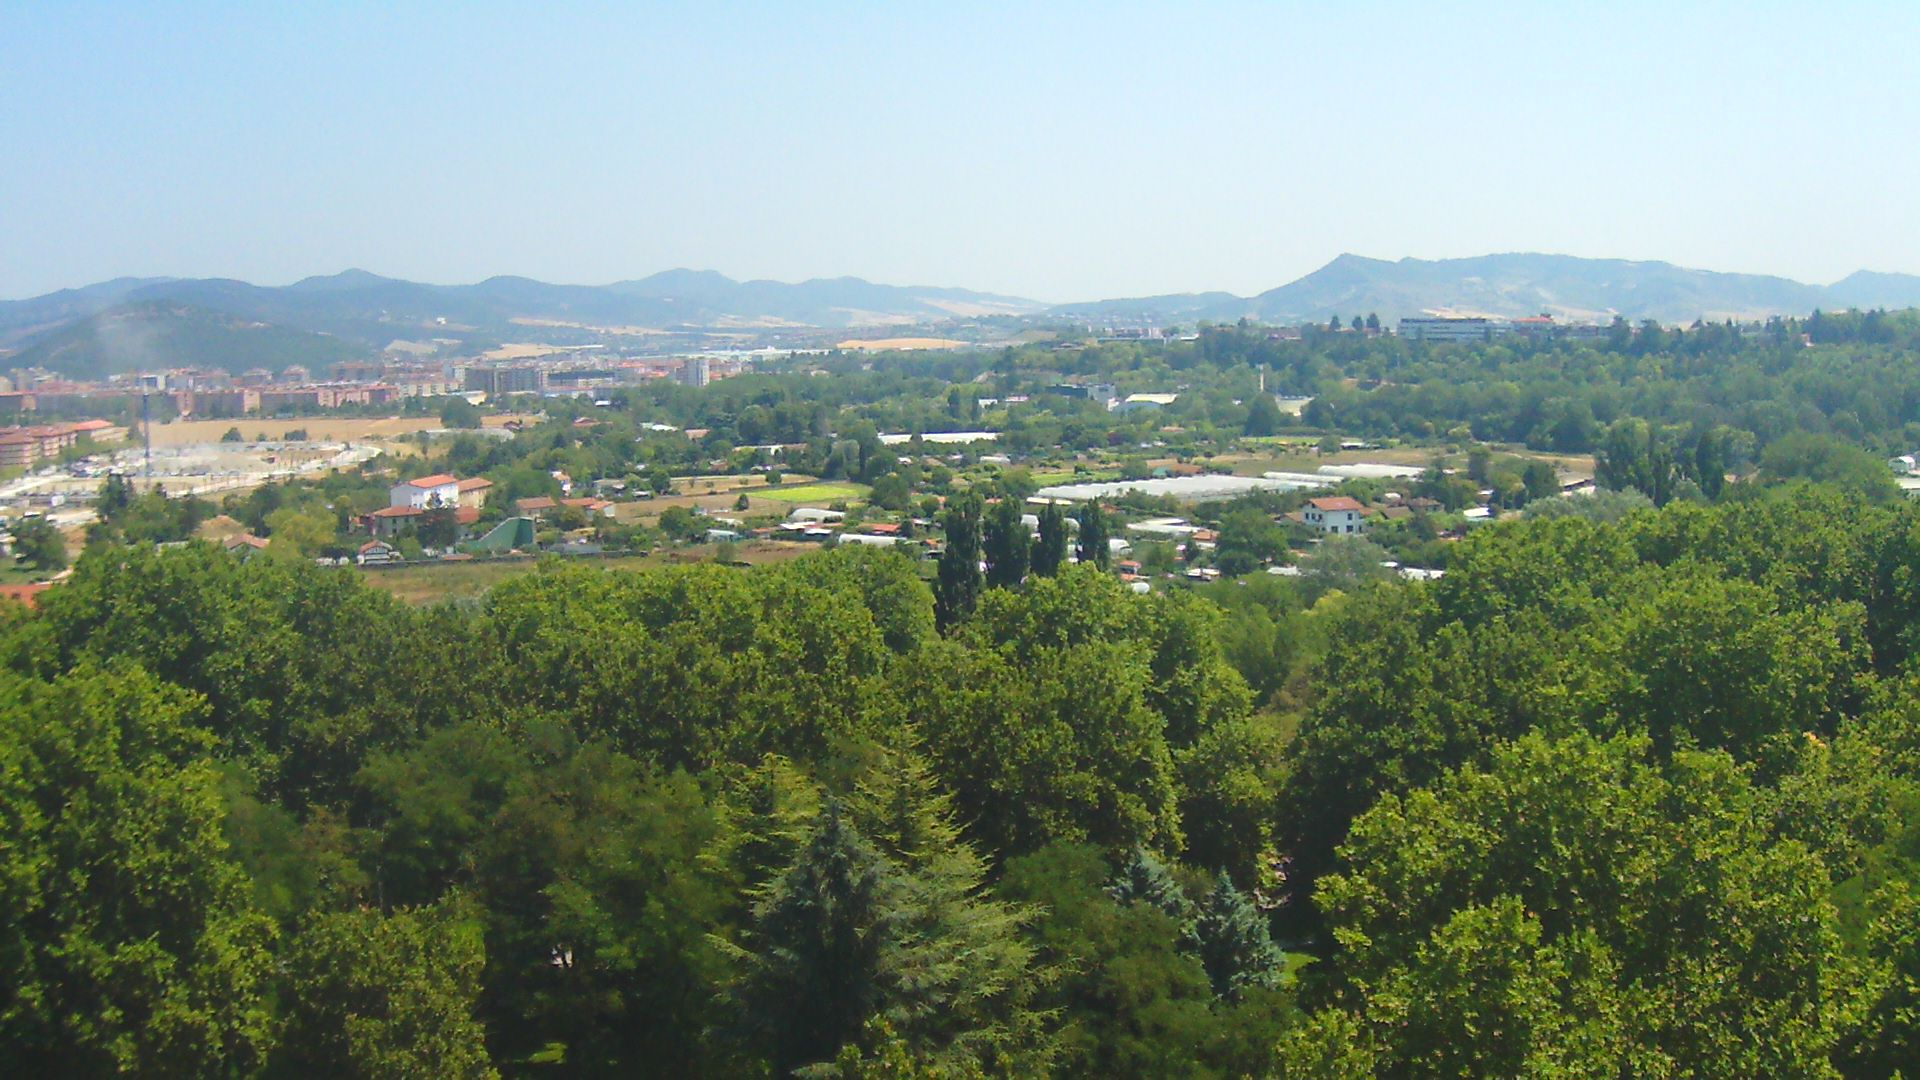 Pamplona So. 13:46